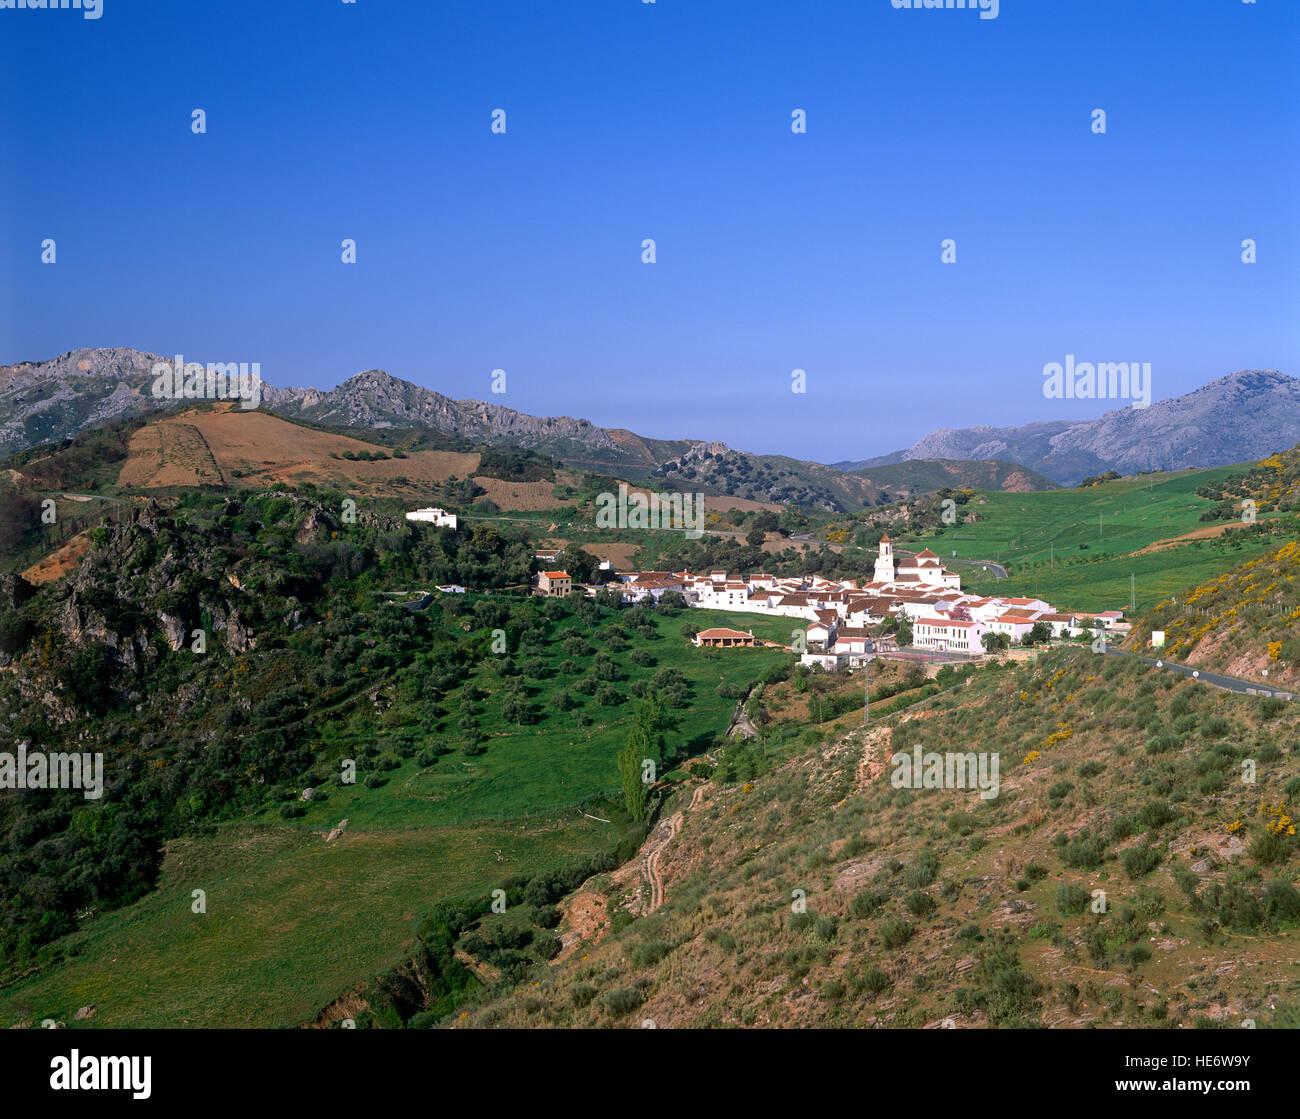 Atajate, pueblo blanco de Andalucía, España. Imagen De Stock